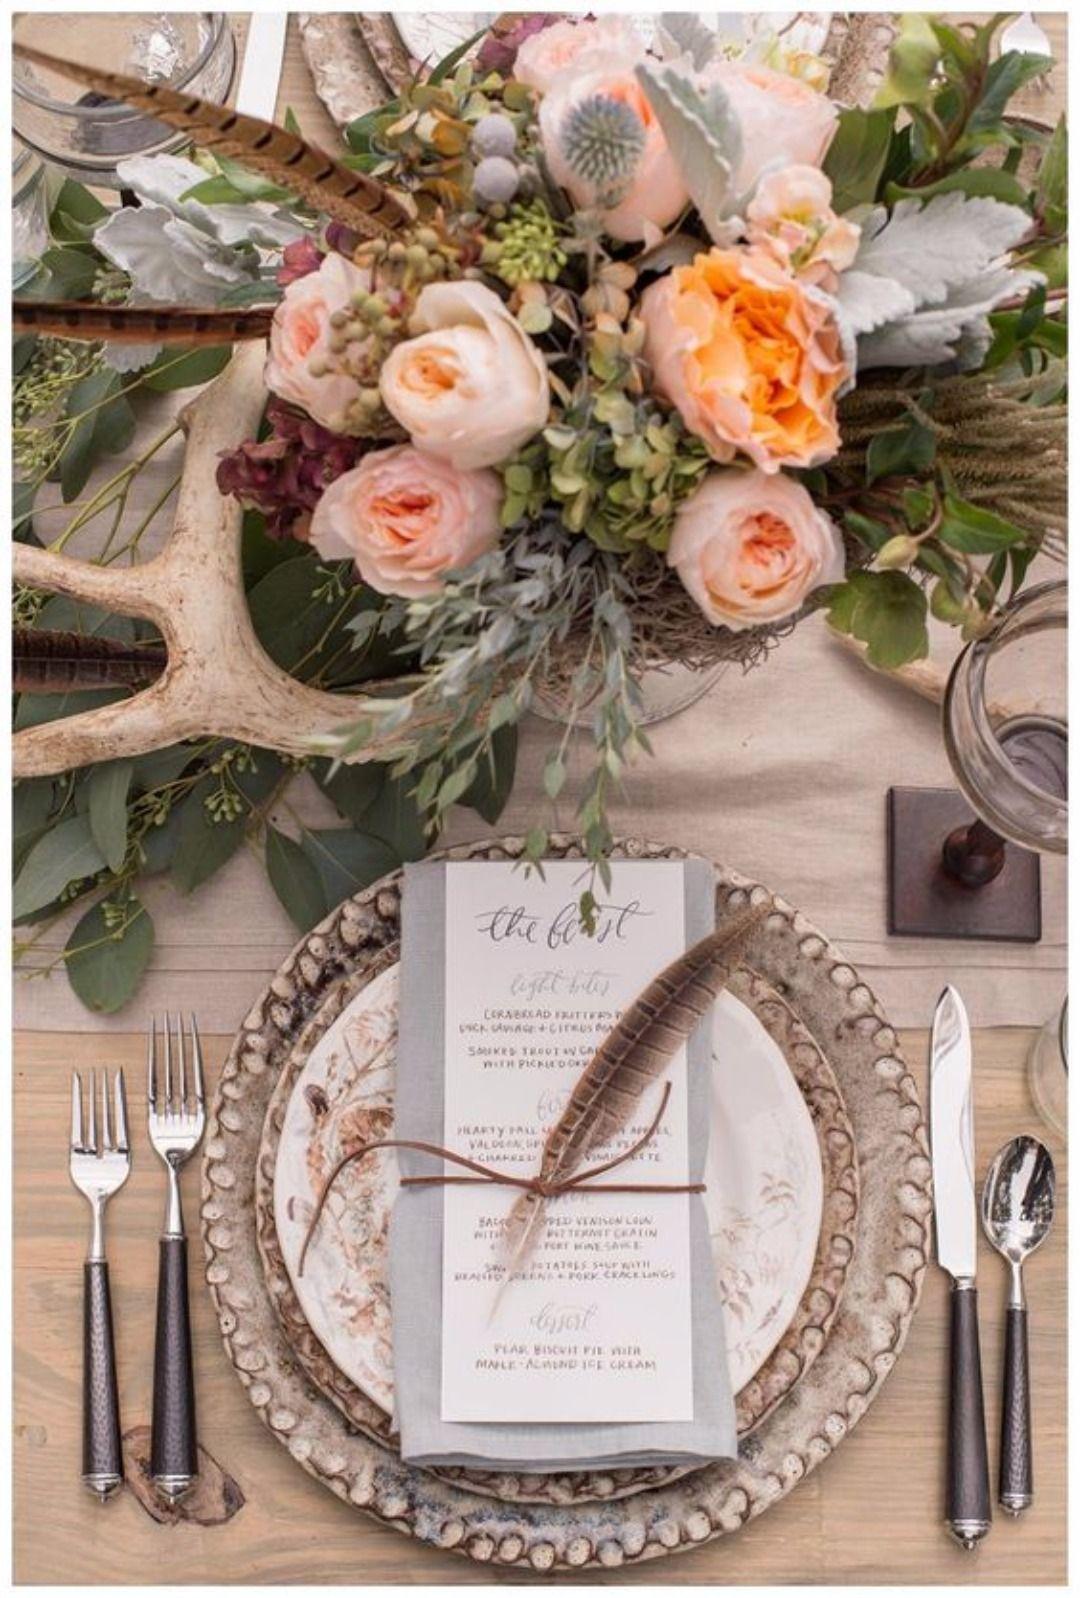 Decoraci n mesa r stica flores naranja vajilla estampada plumas wedding ideas pinterest - Vajilla rustica ...